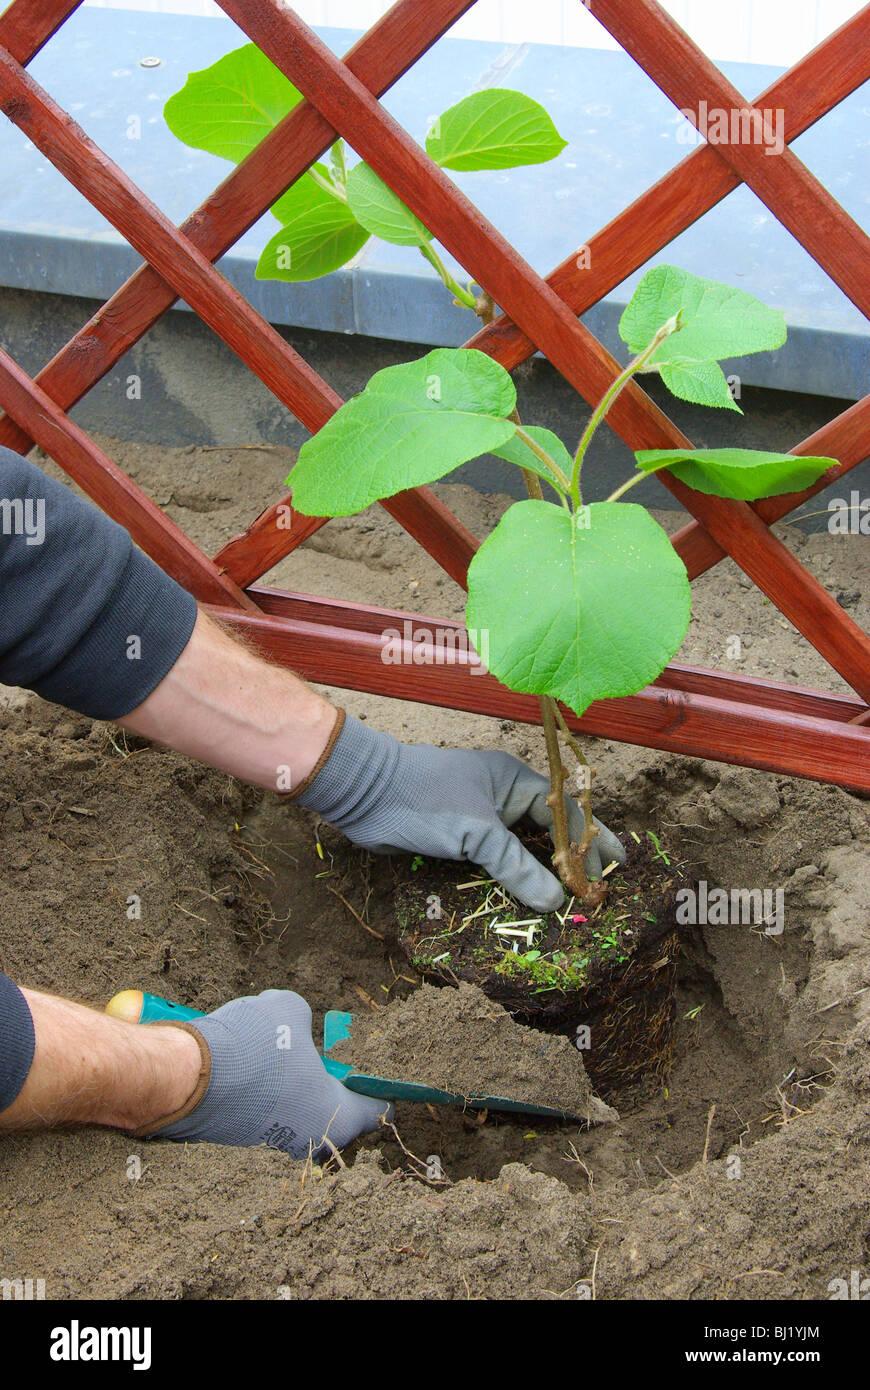 Kiwipflanze pflanzen - planting a kiwi plant 02 - Stock Image